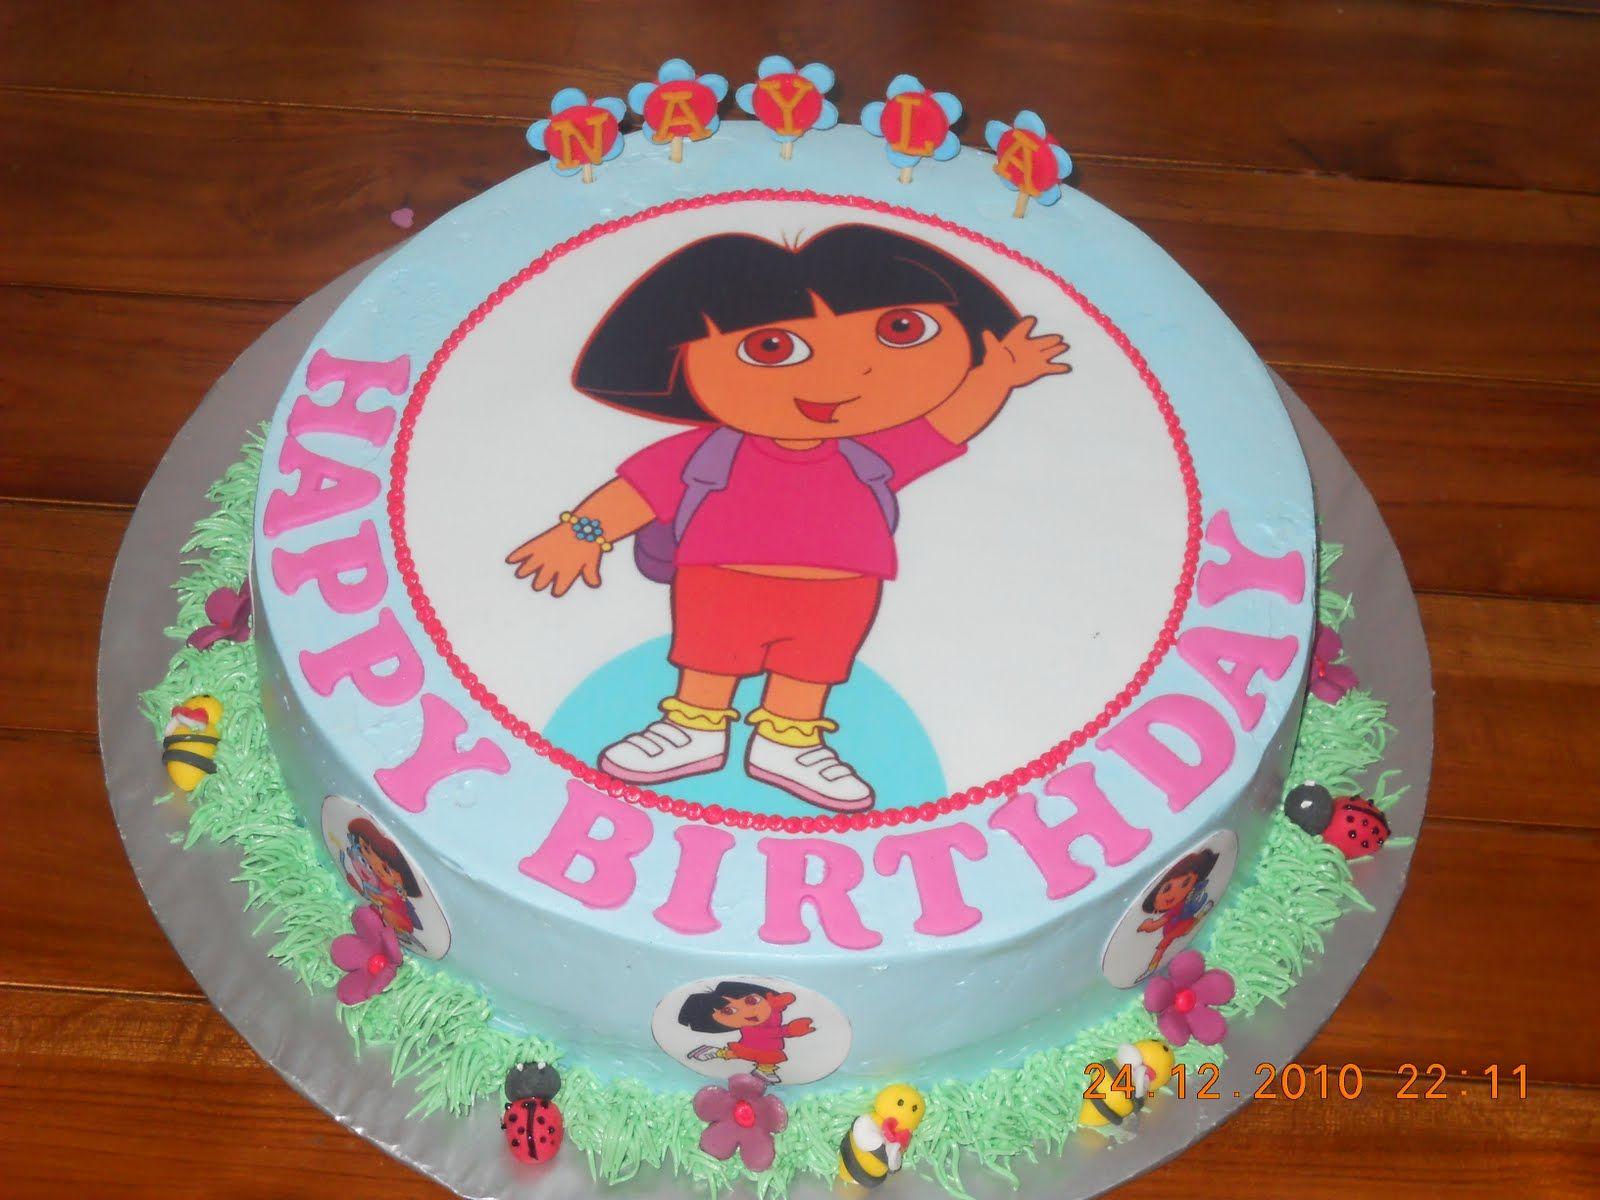 dora cakes | MyPu3 Cake House | DORA | Pinterest | Dora cake and Cake